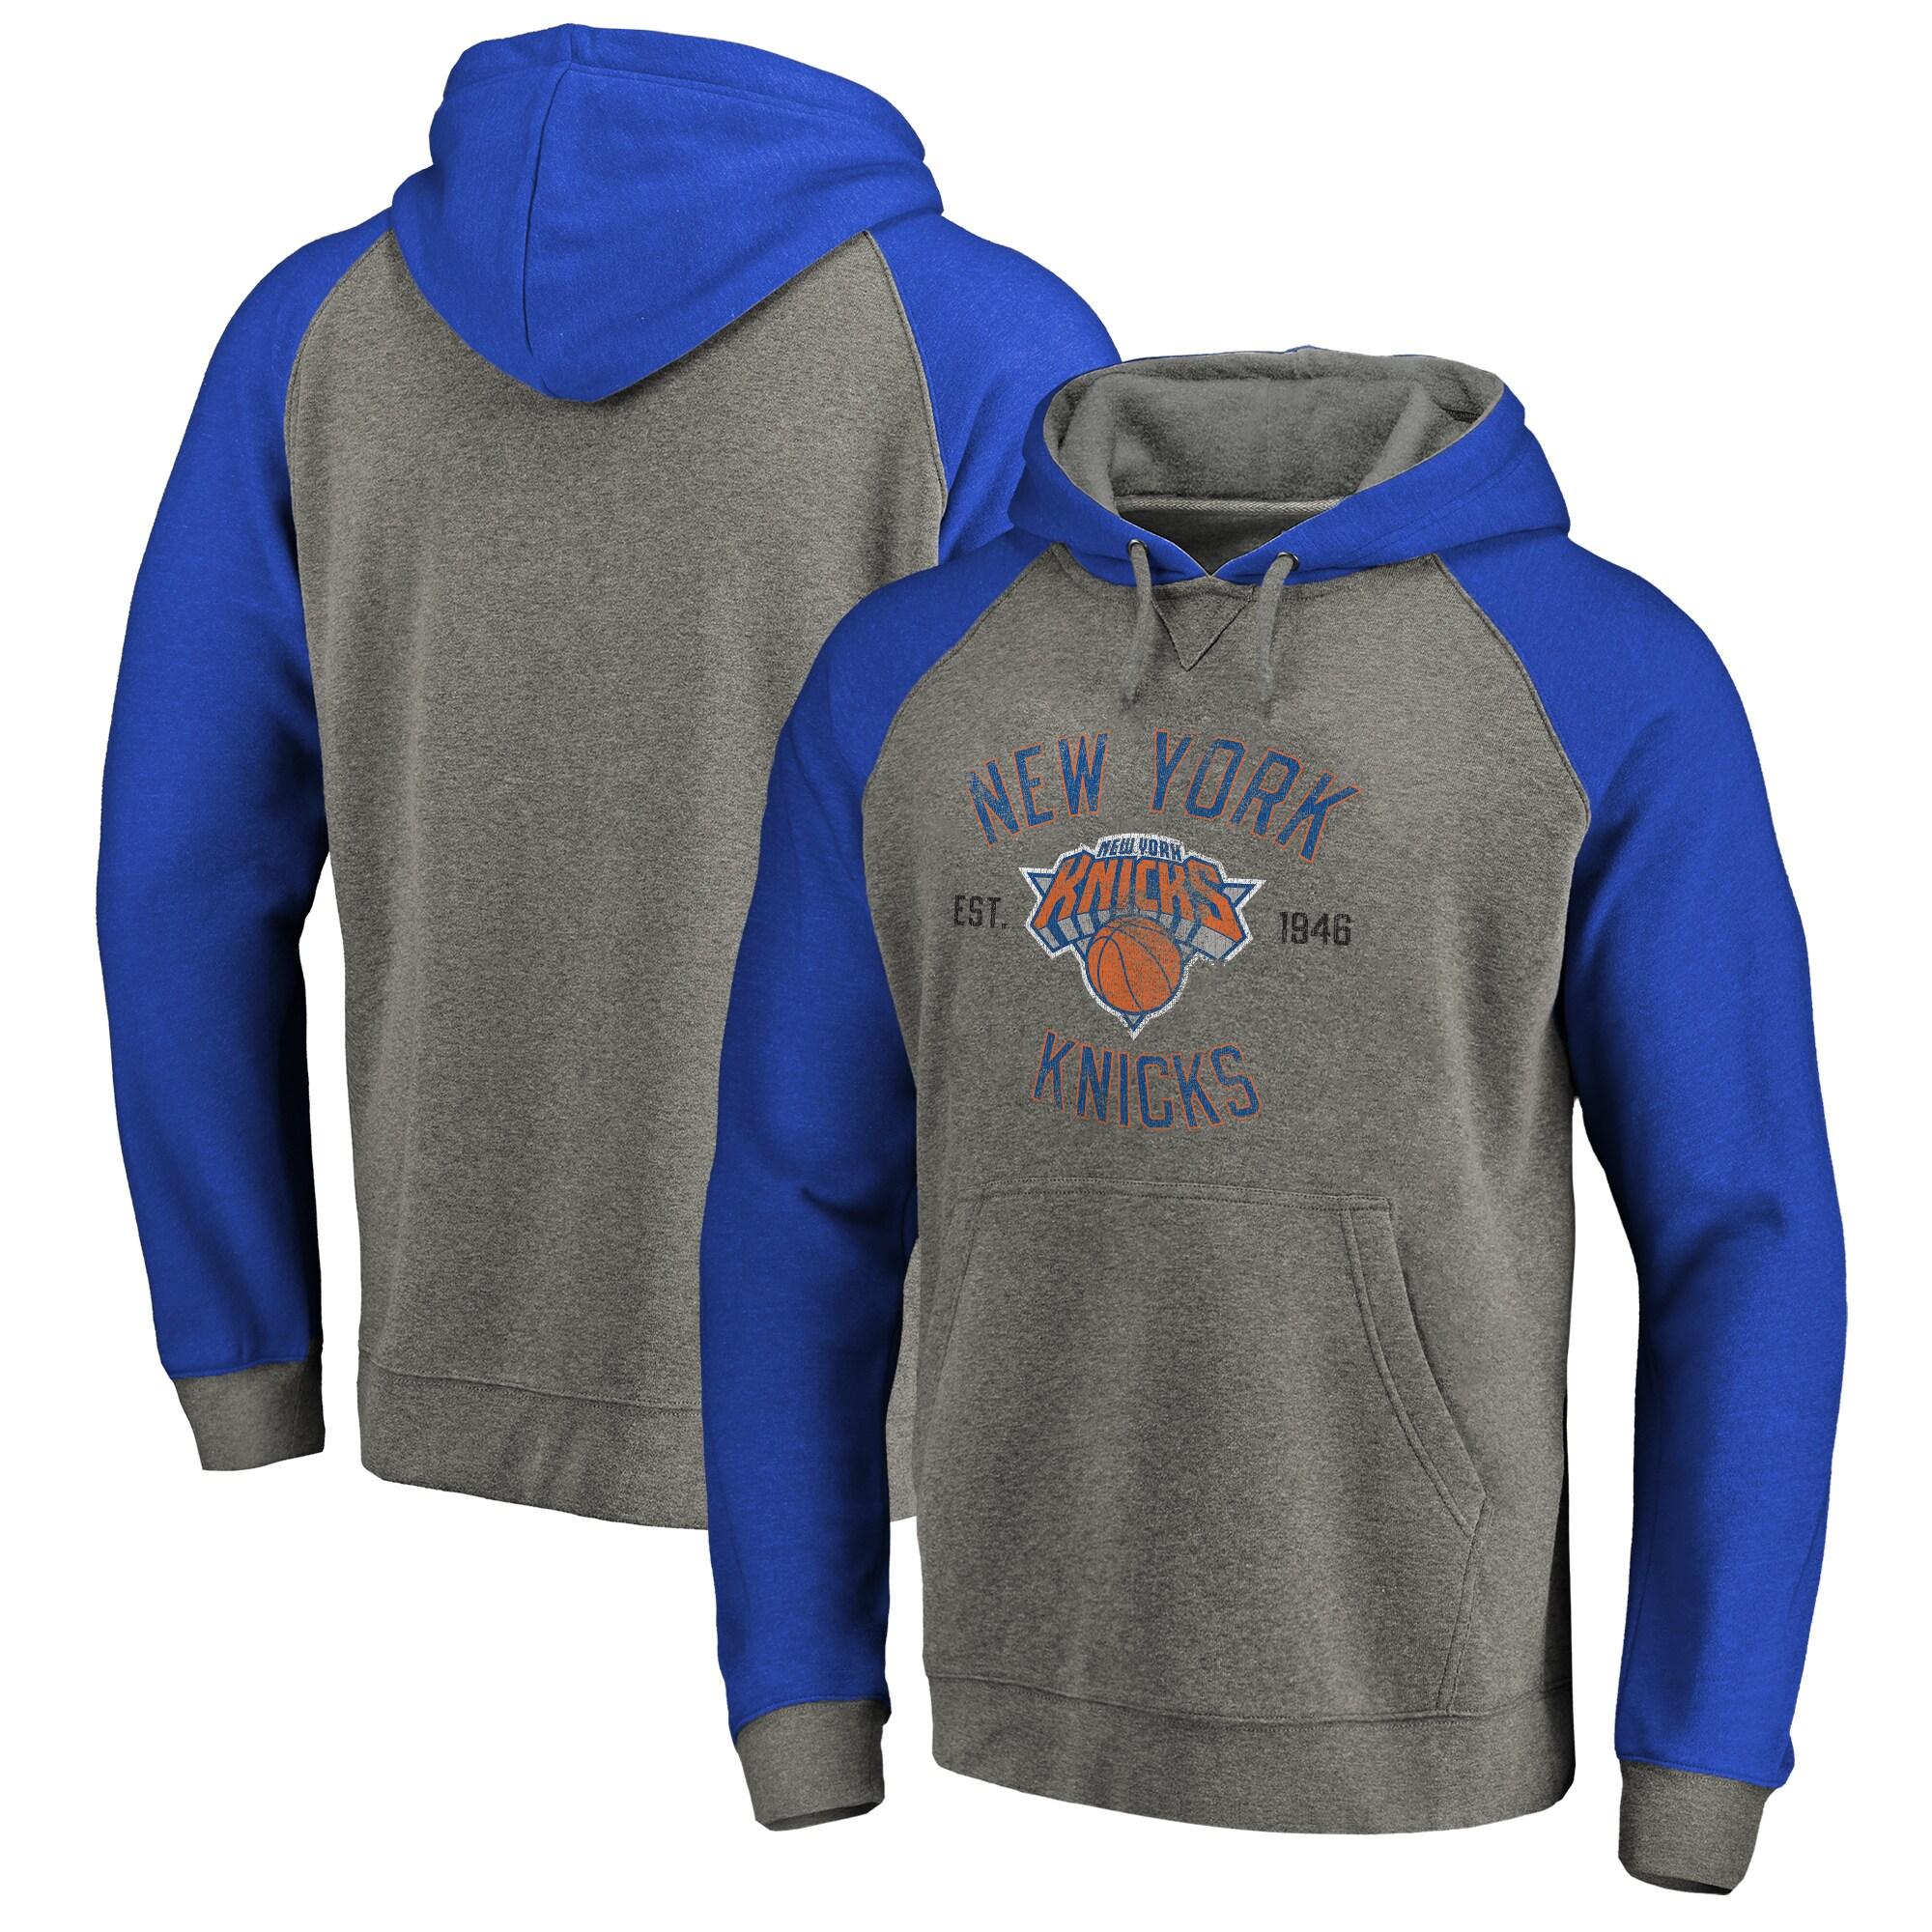 New York Knicks Fanatics Branded Heritage Tri-Blend Raglan Pullover Hoodie - Heathered Gray